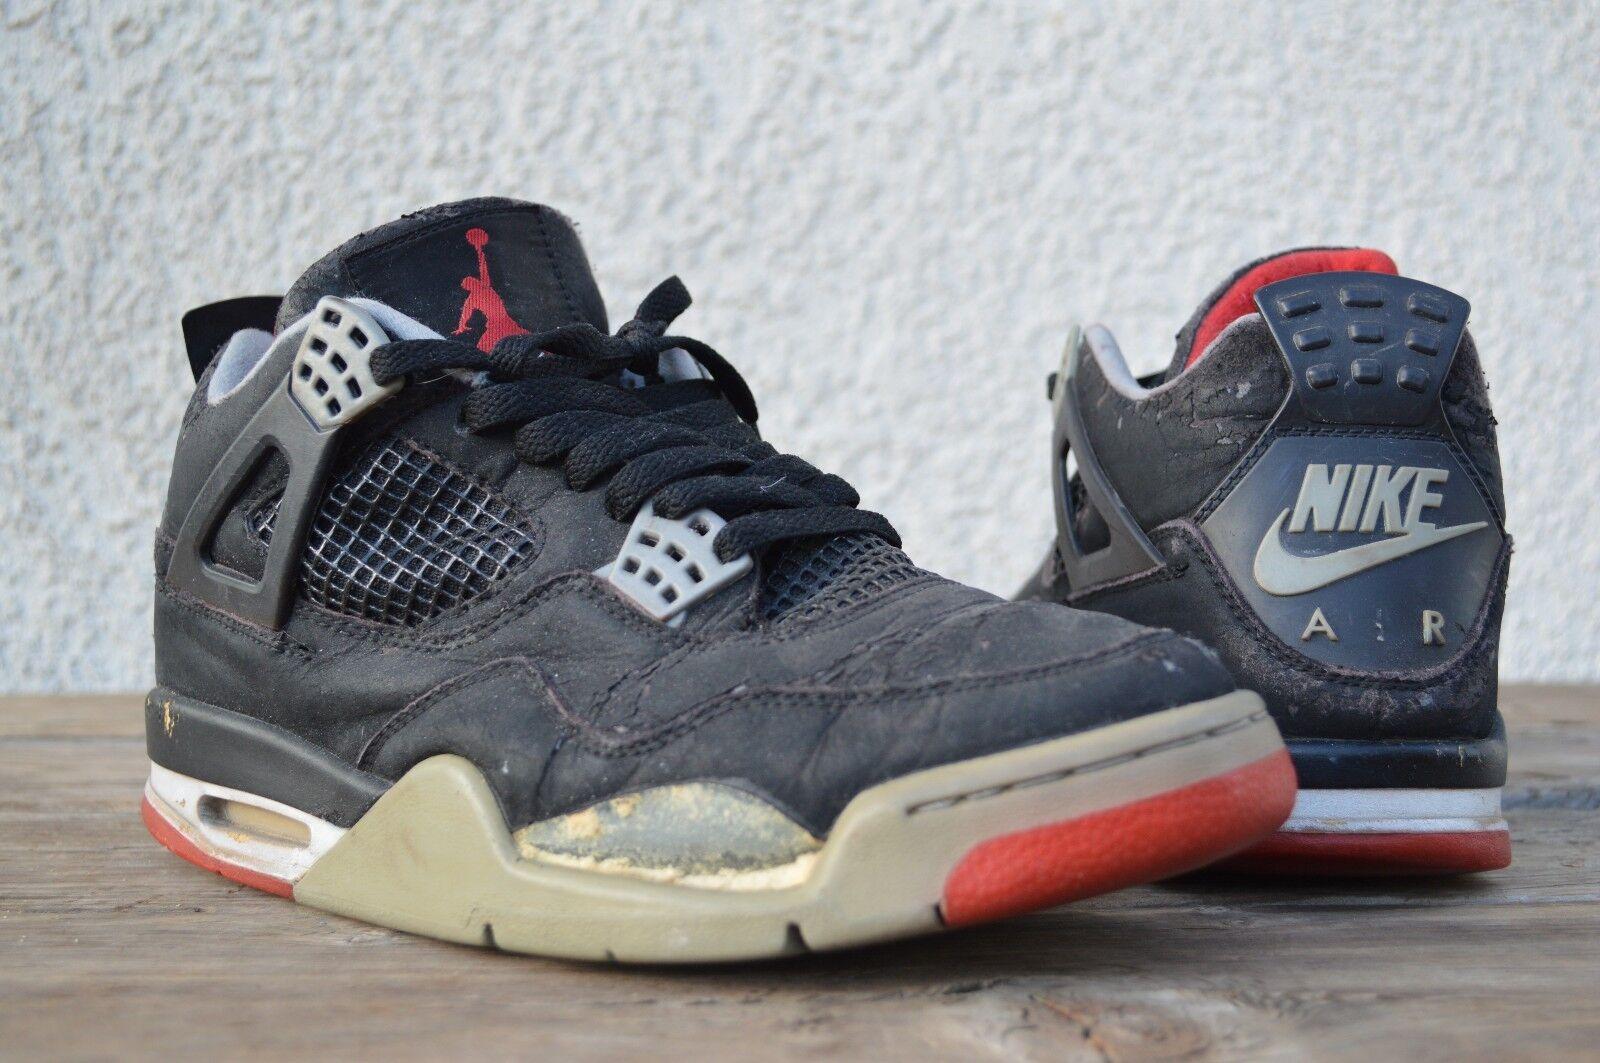 1999 Nike Air Jordan Retro 4 IV Bred Black Cement NIKE AIR BRED 4 size 9.5